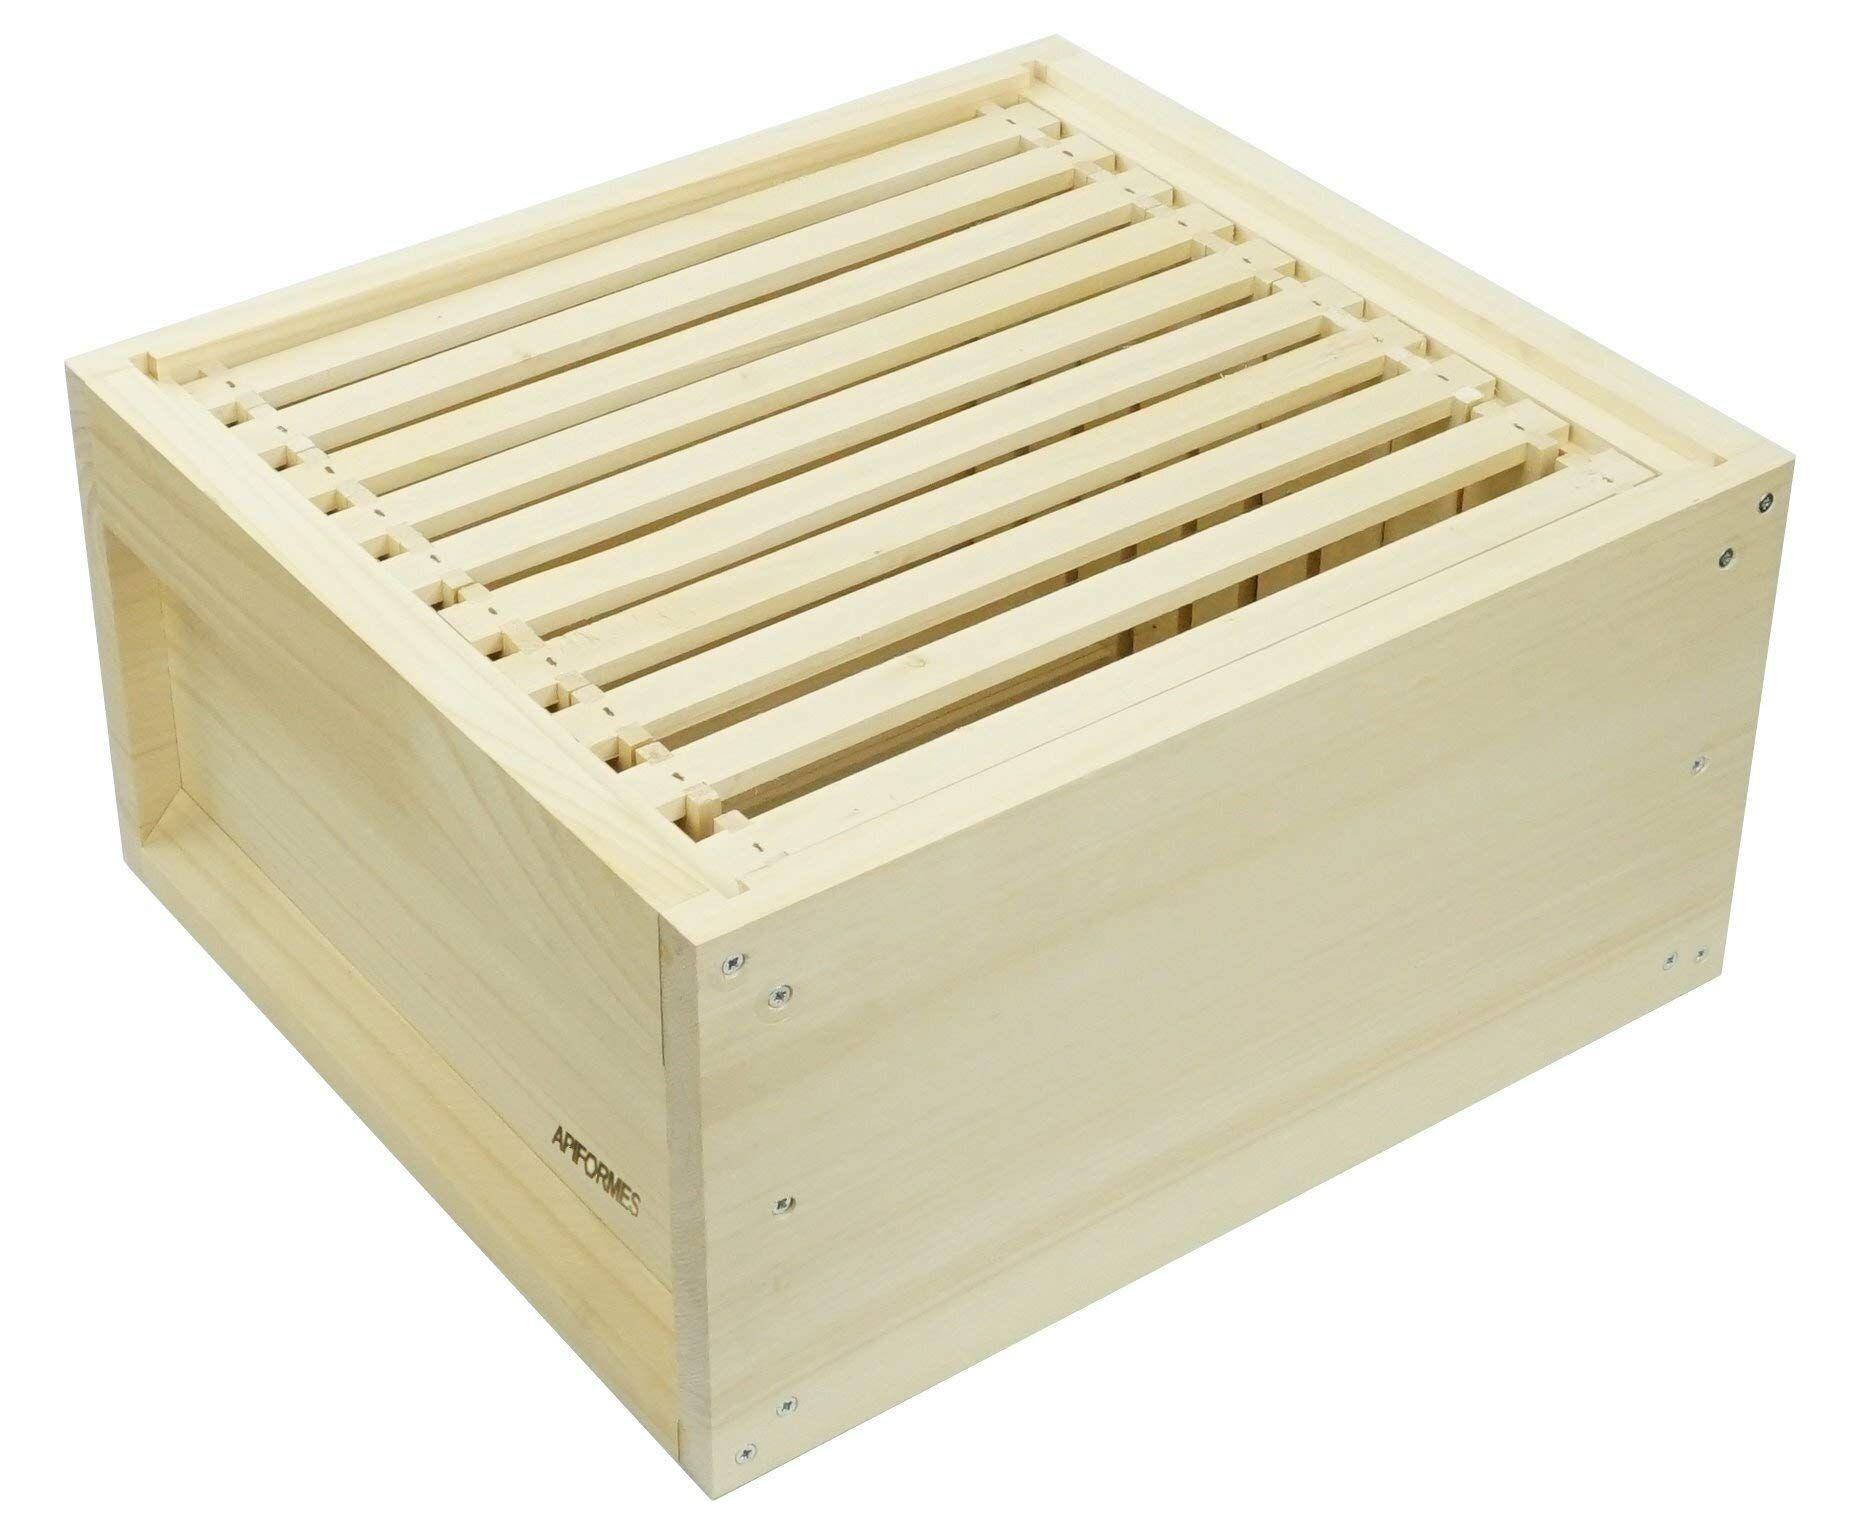 Shop Bee keeping supplies, Beech wood, Linden wood